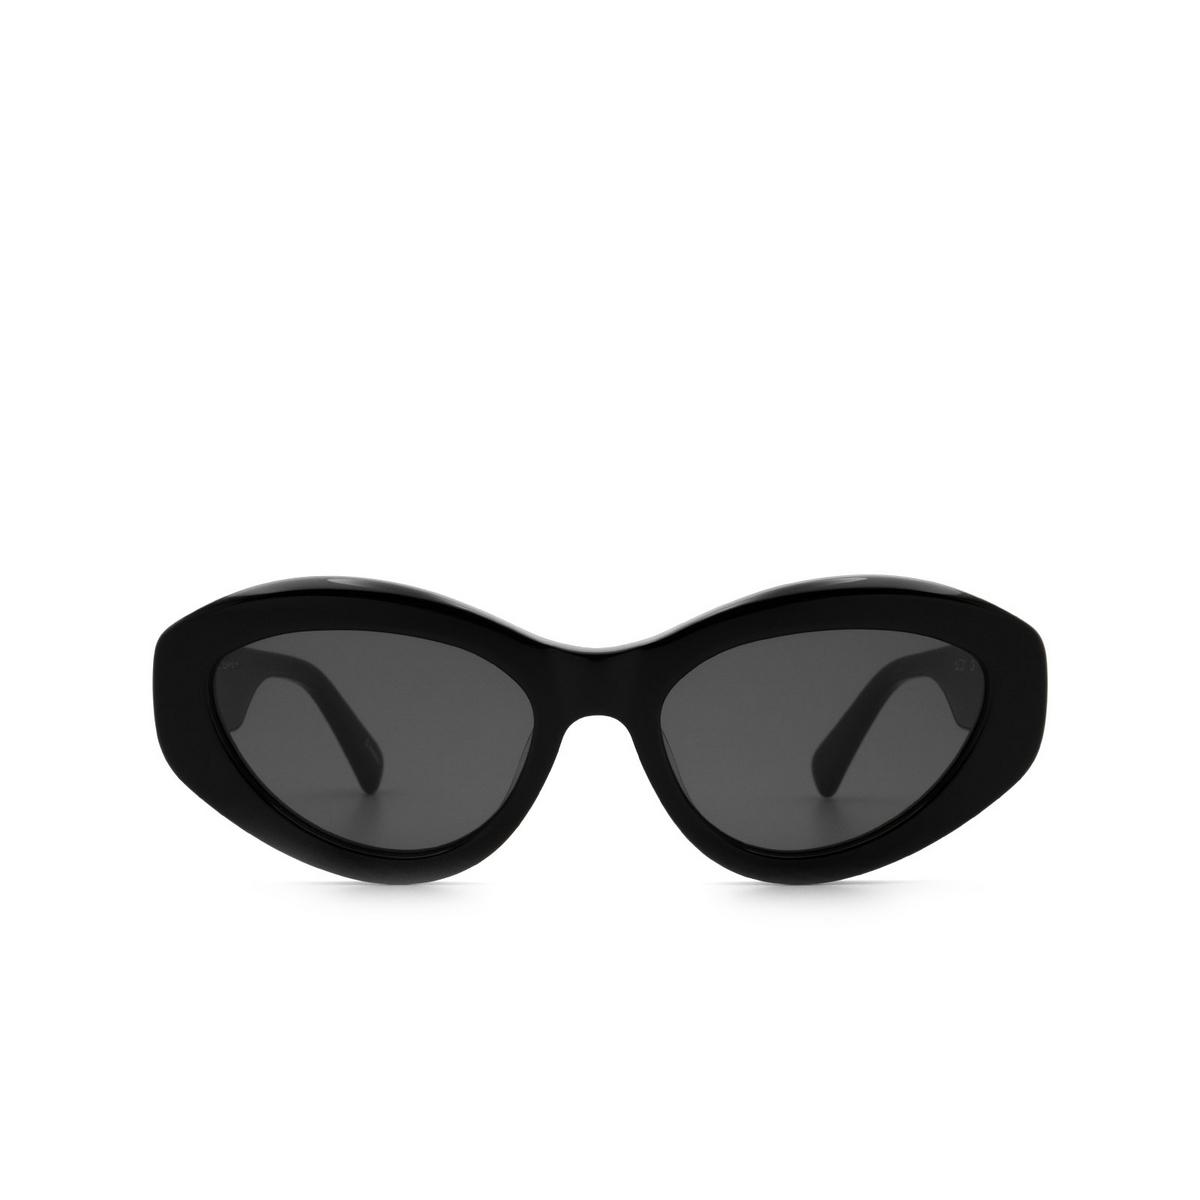 Chimi® Cat-eye Sunglasses: 09 color Black.